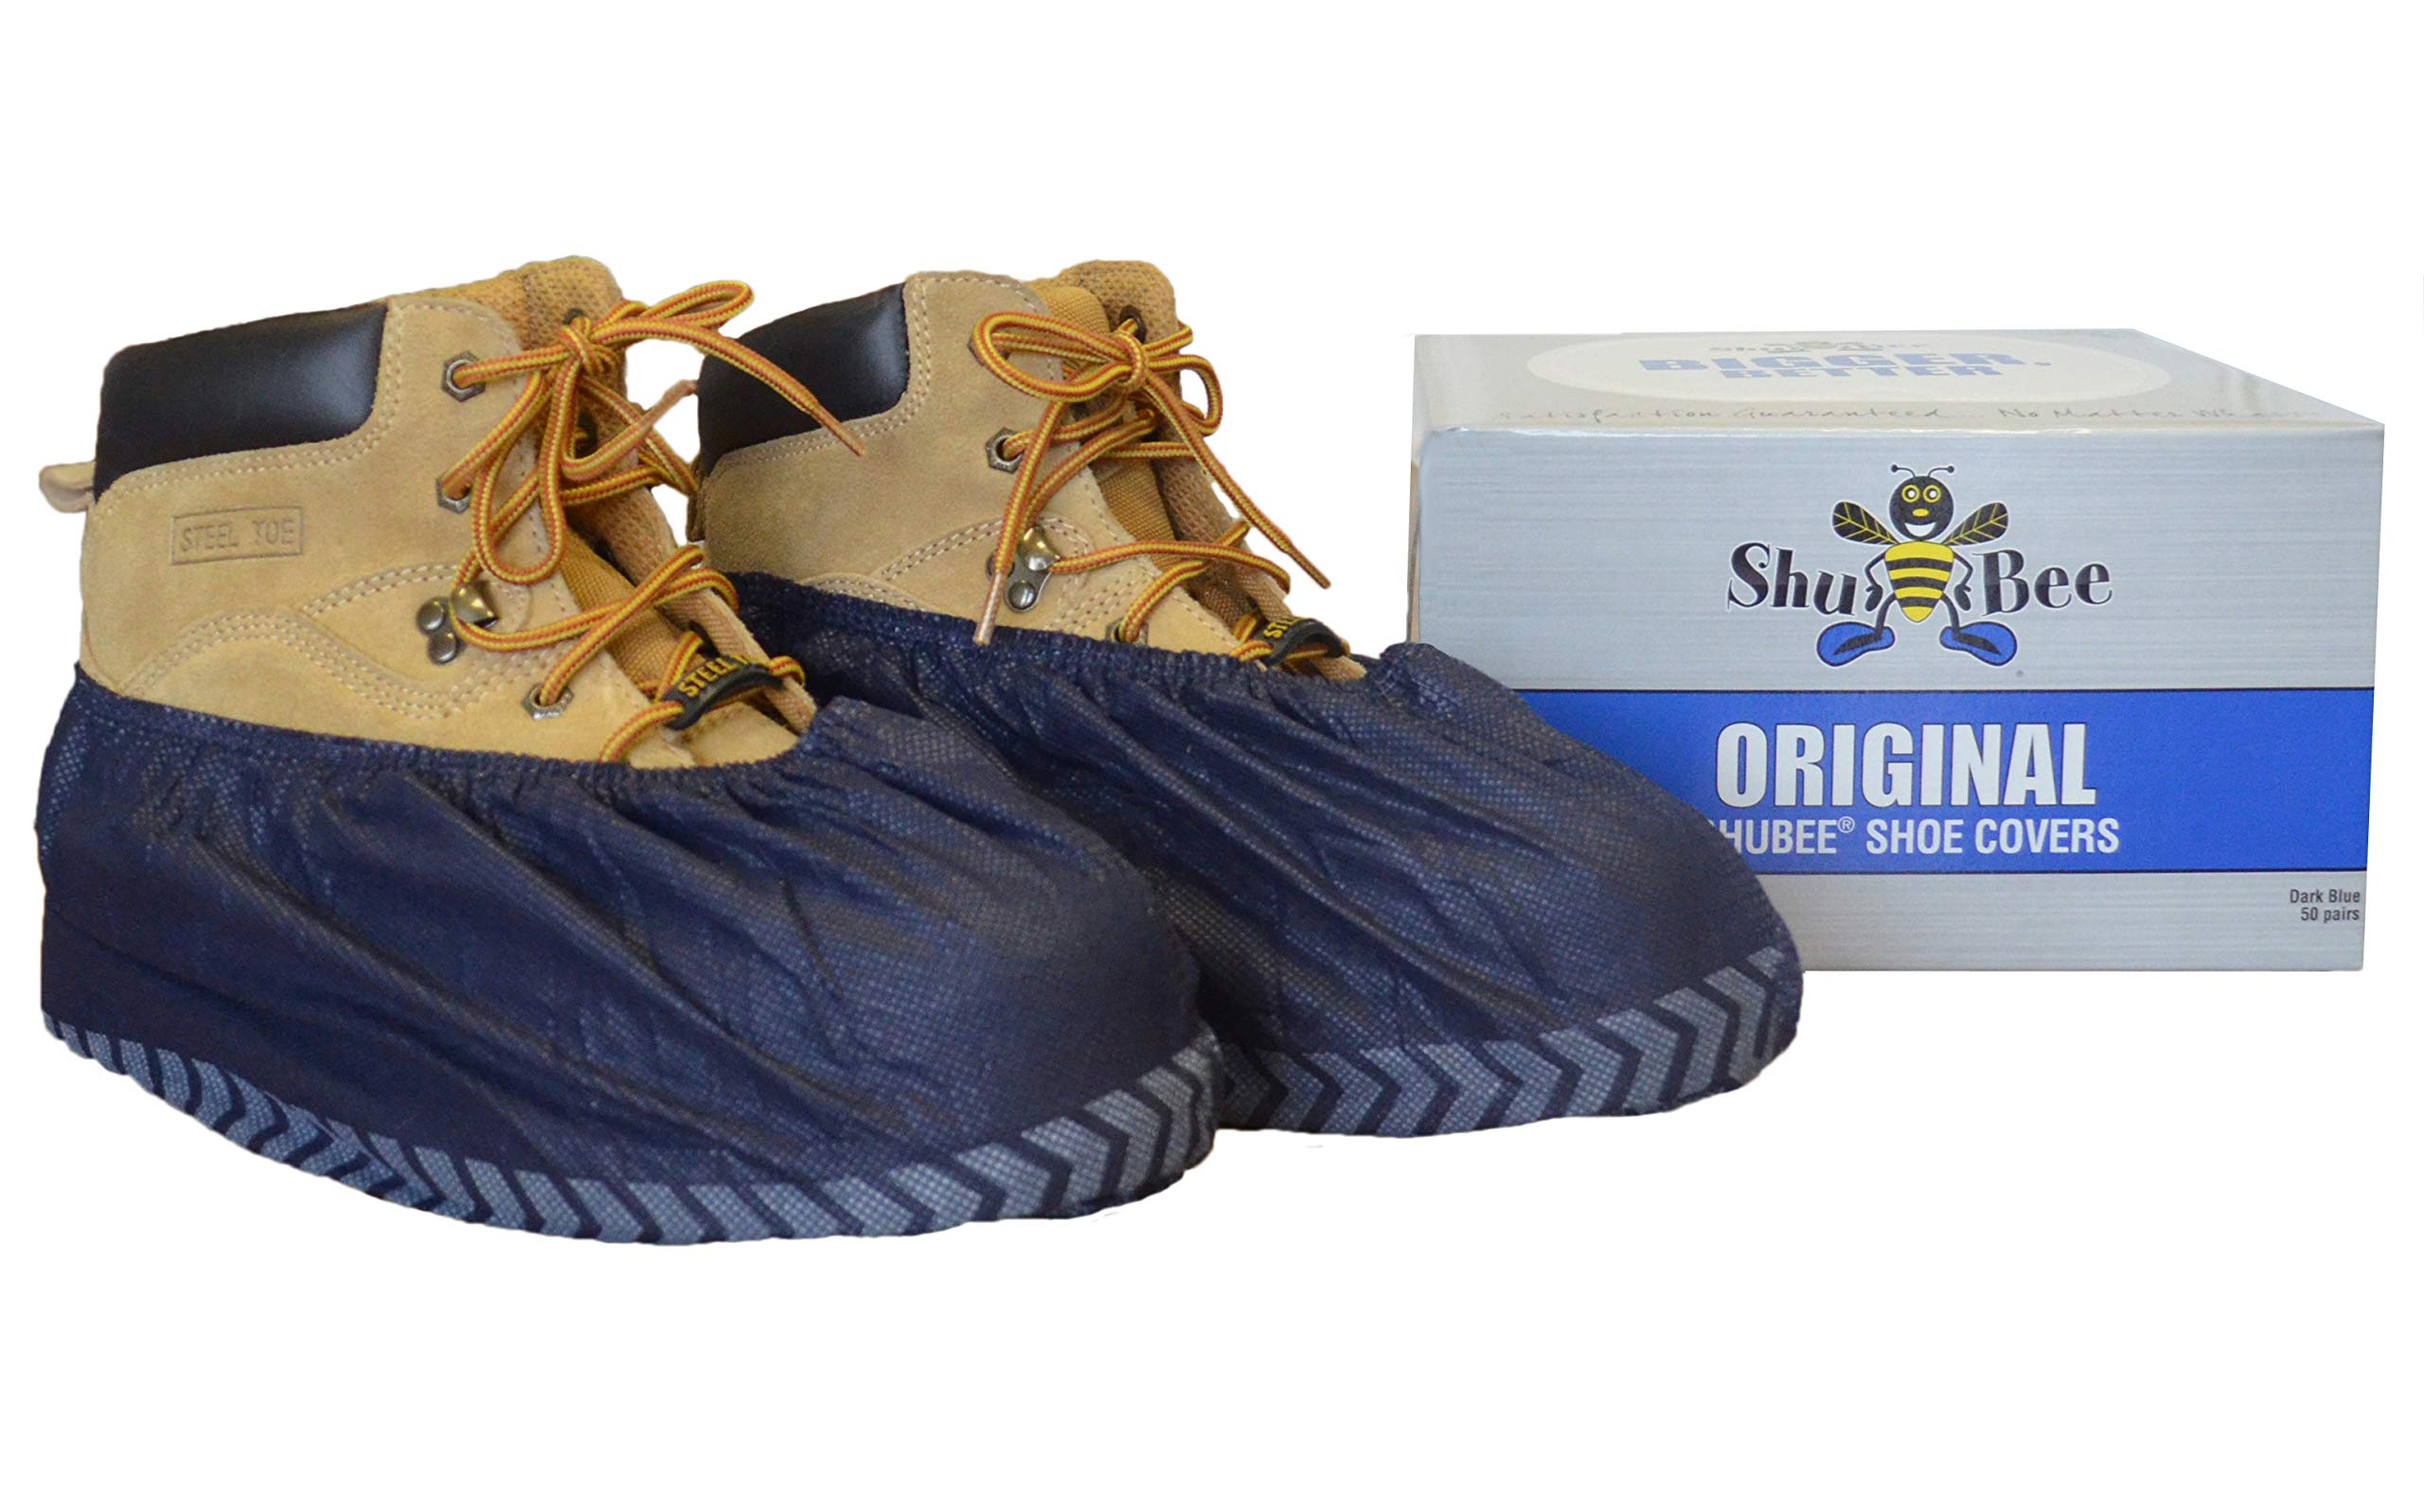 ShuBee Original Shoe Covers, Dark Blue (50 Pair) by ShuBee